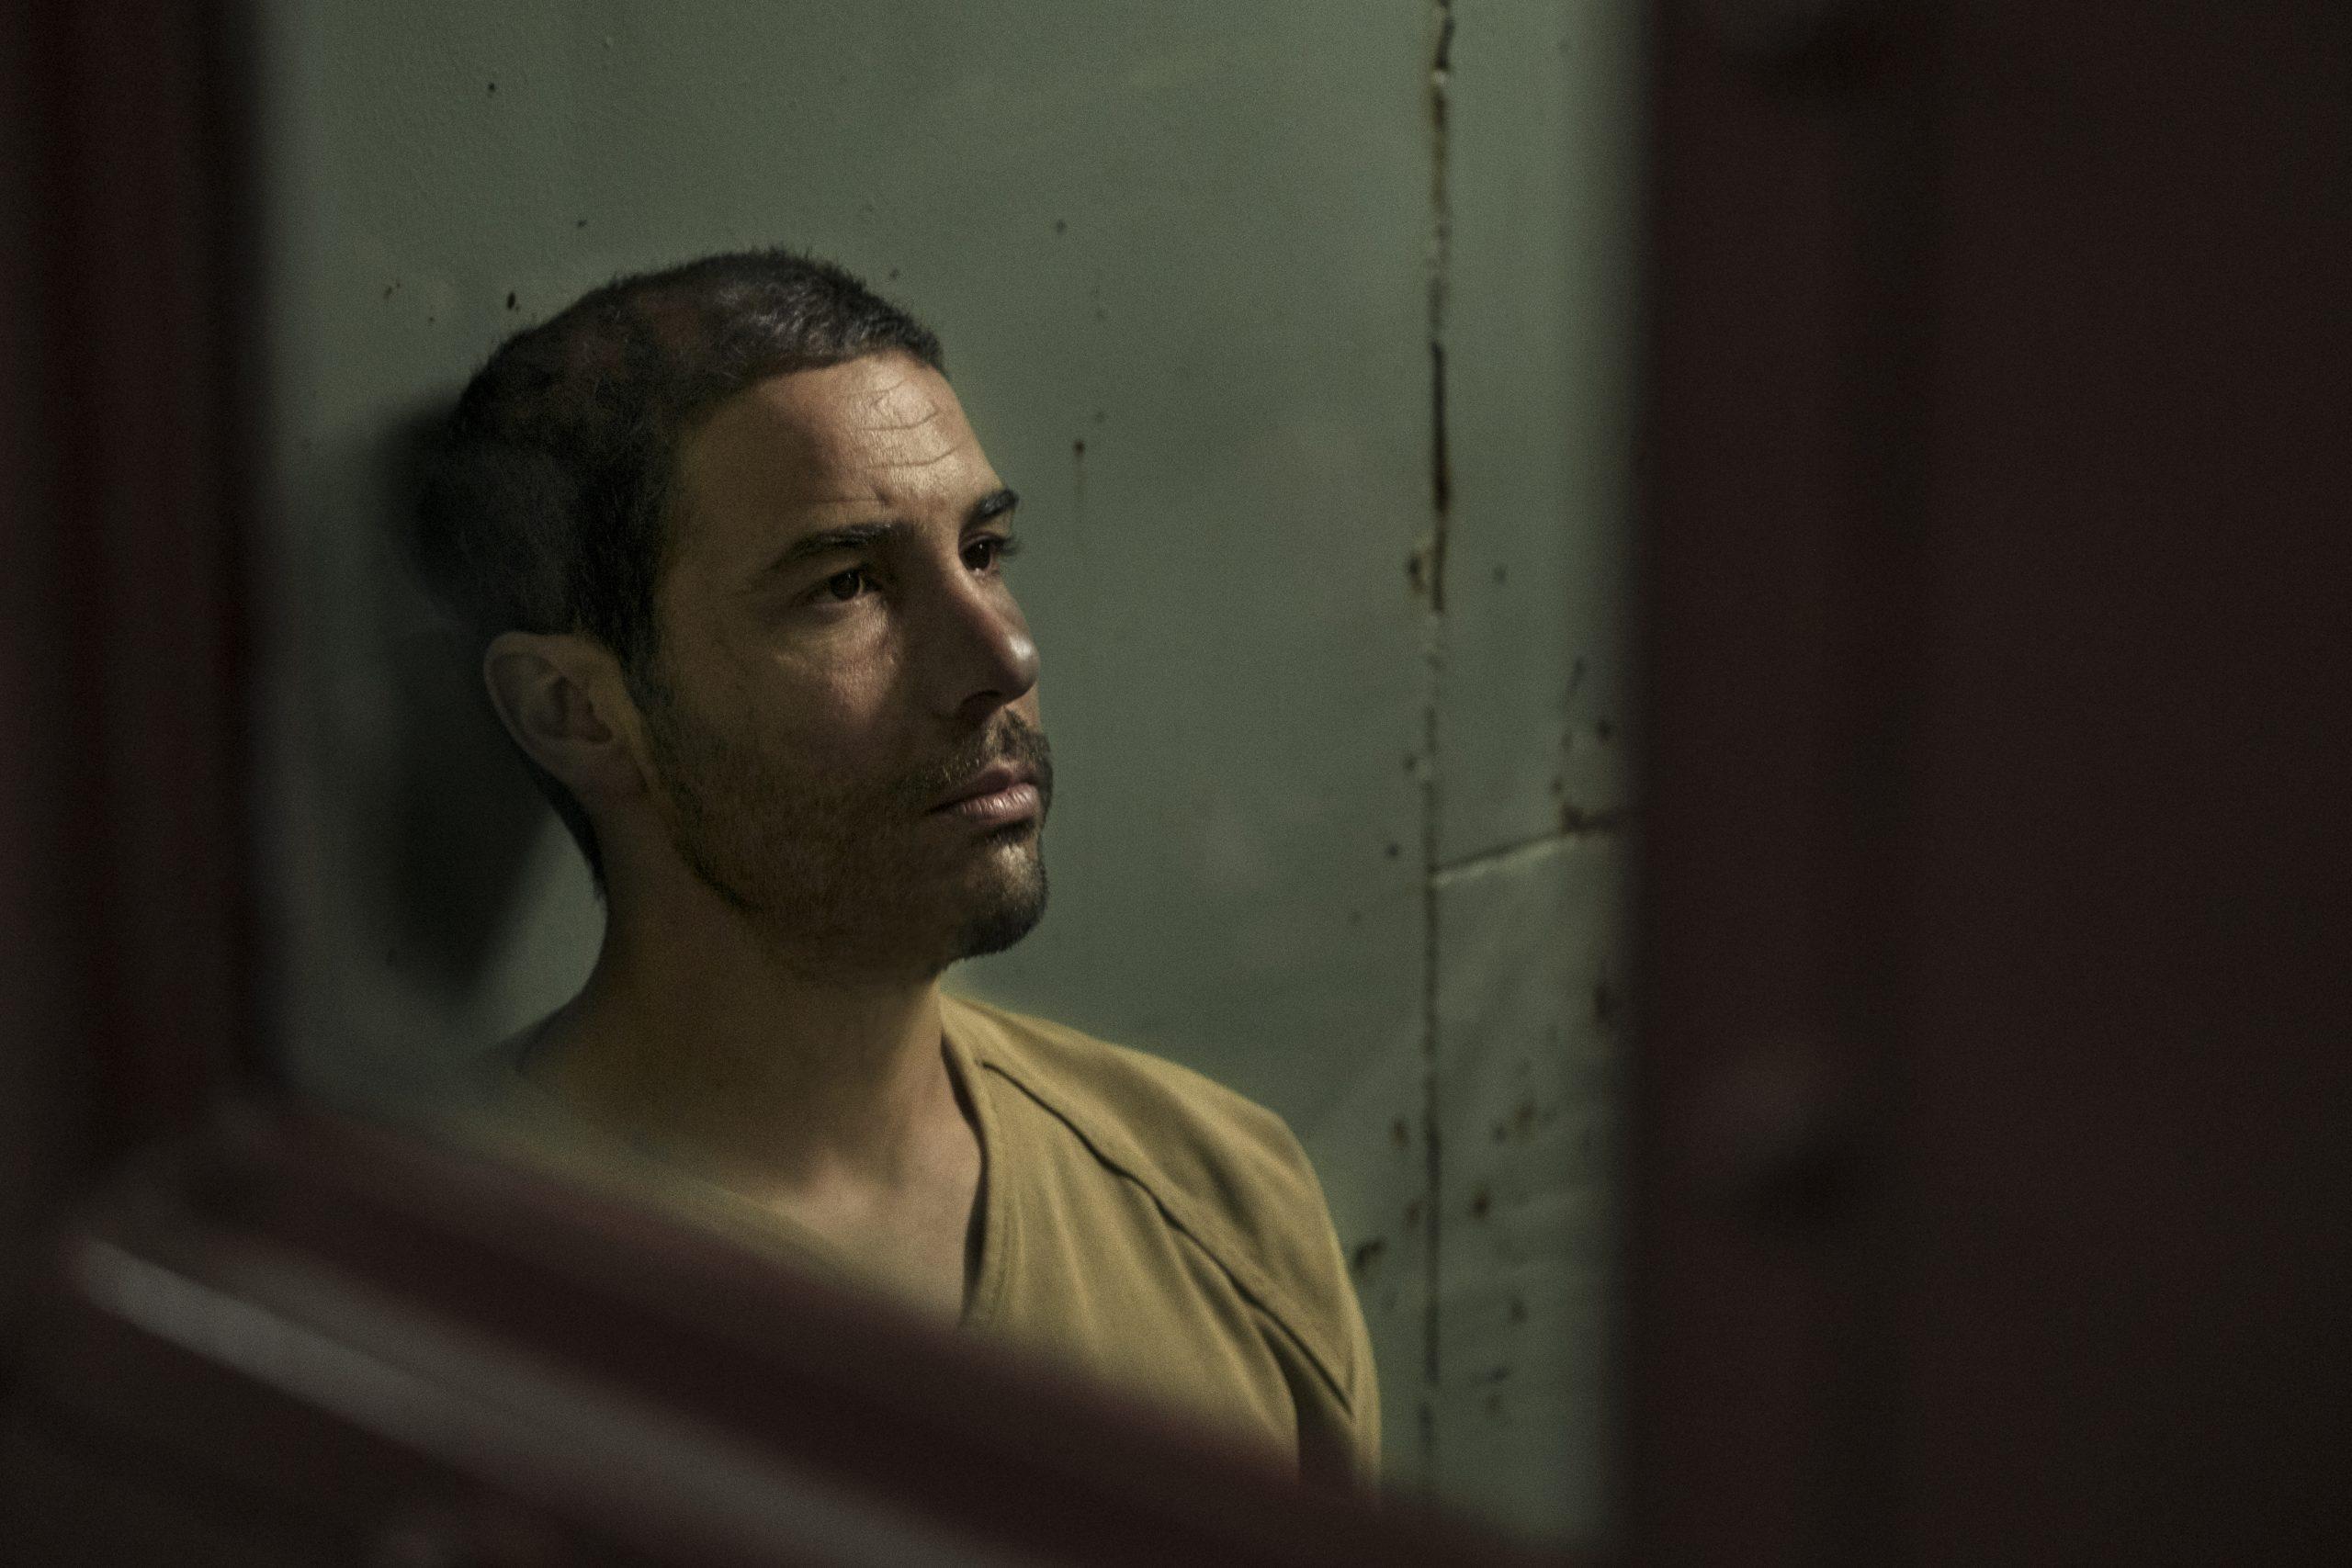 MonoFilm The Mauritanian มอริทาเนียน : พลิกคดี จองจำอำมหิต โจดี้ ฟอสเตอร์